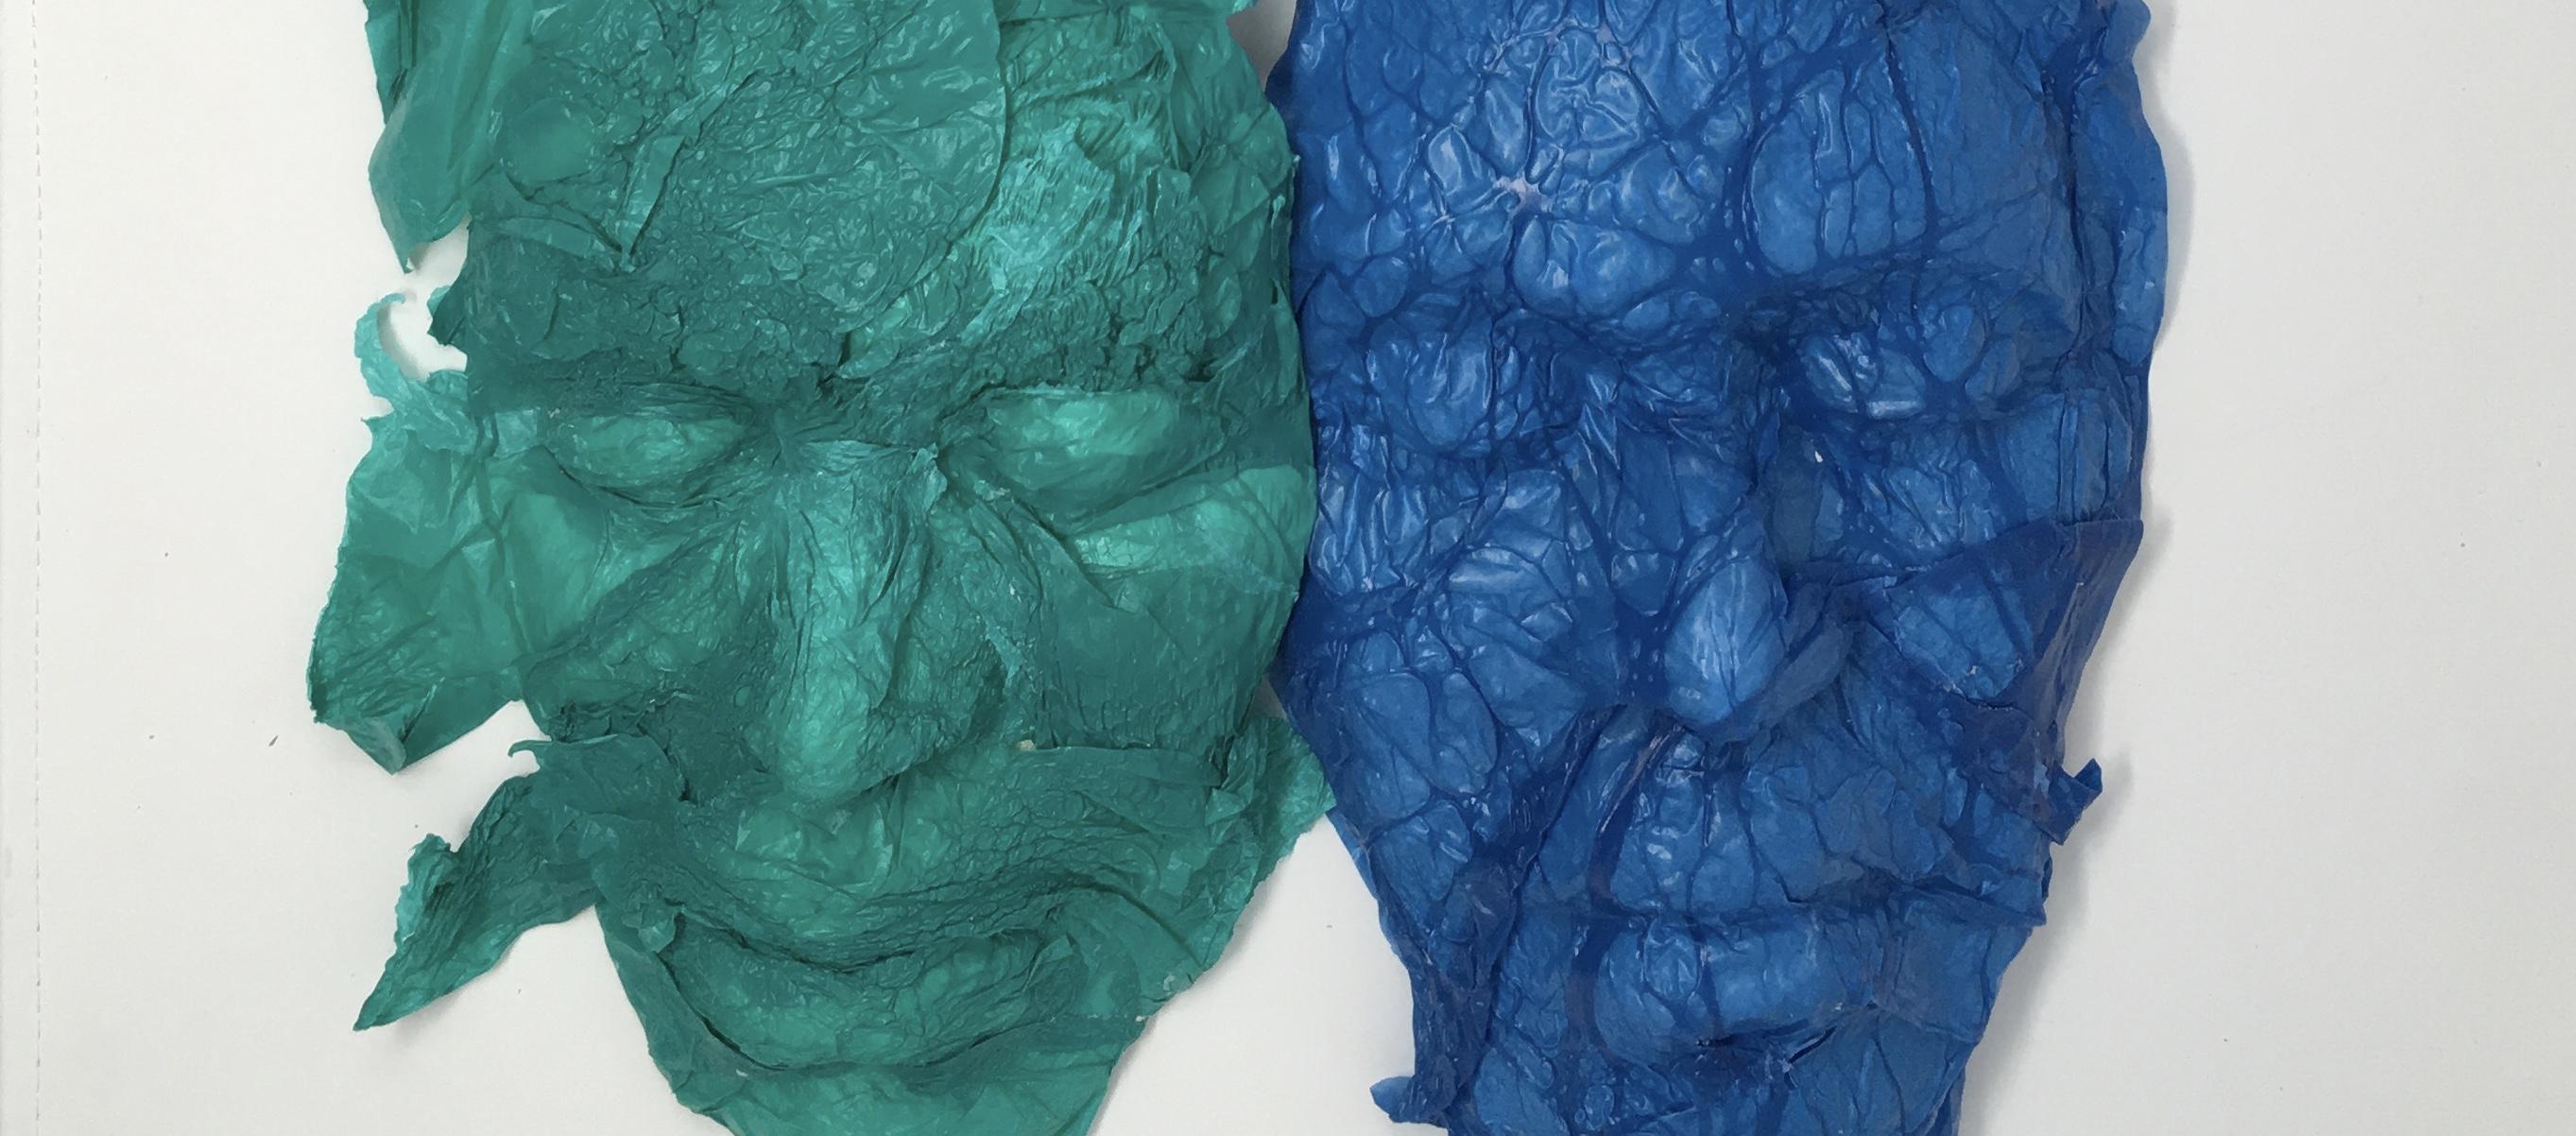 Rachel Reid Bag Ladies, artists on pollution